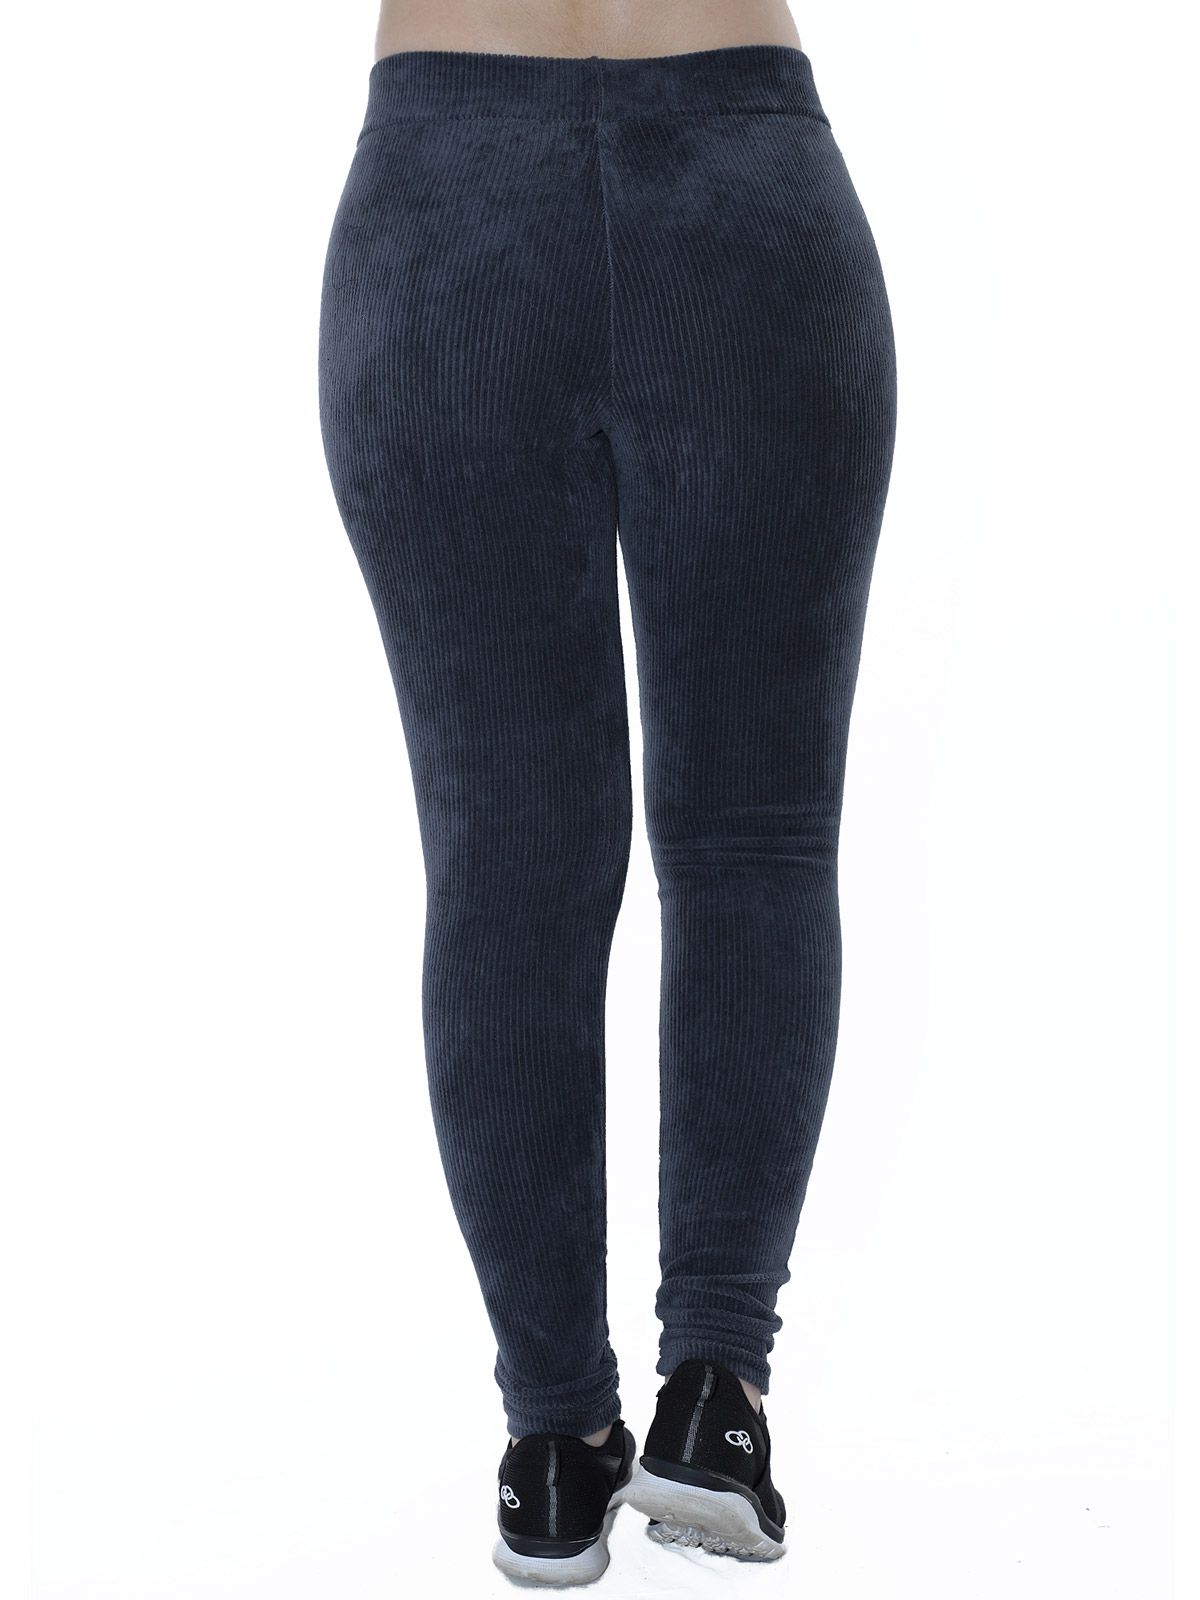 Calça Legging Feminina Veludo Cotele Cinza